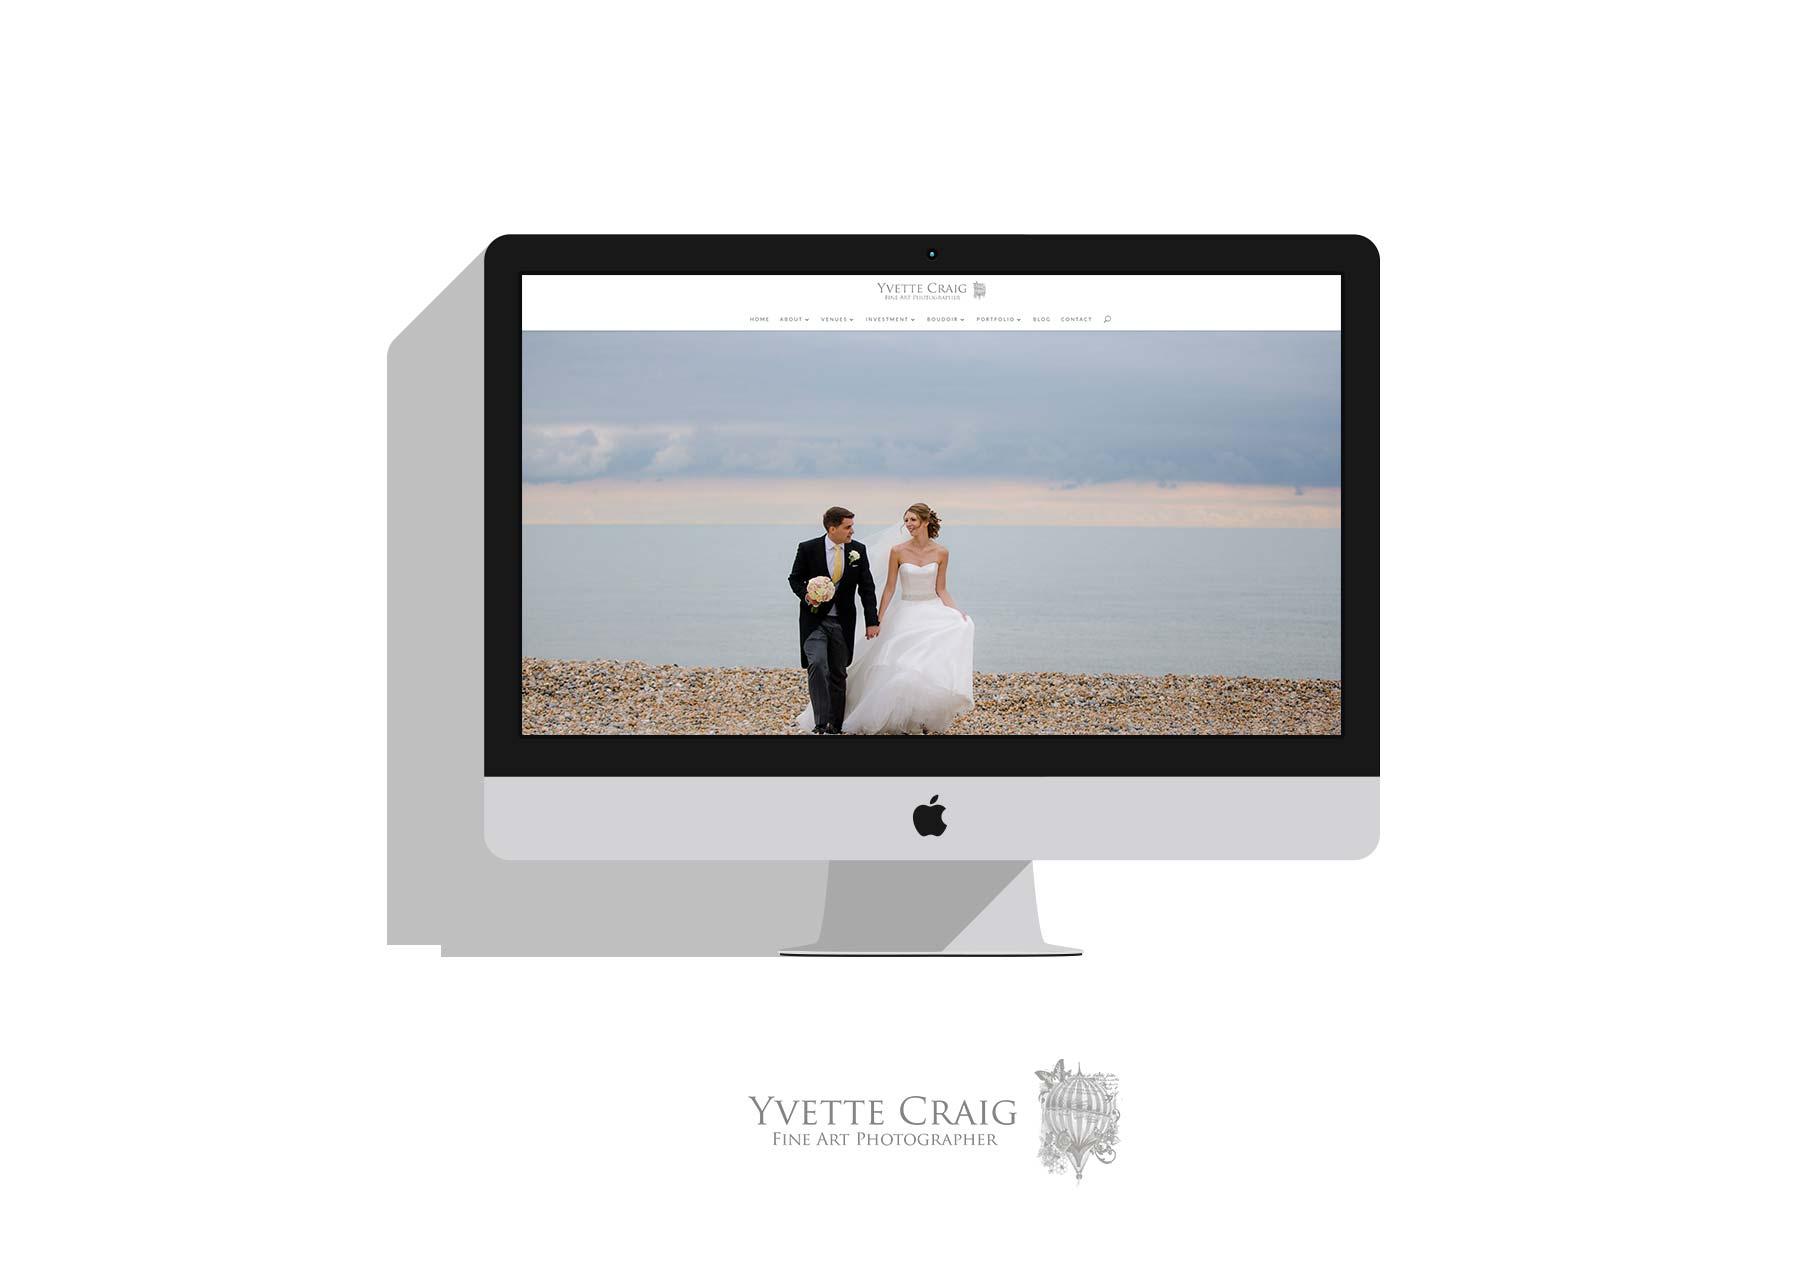 Mockup of Yvette Craig Photographs website